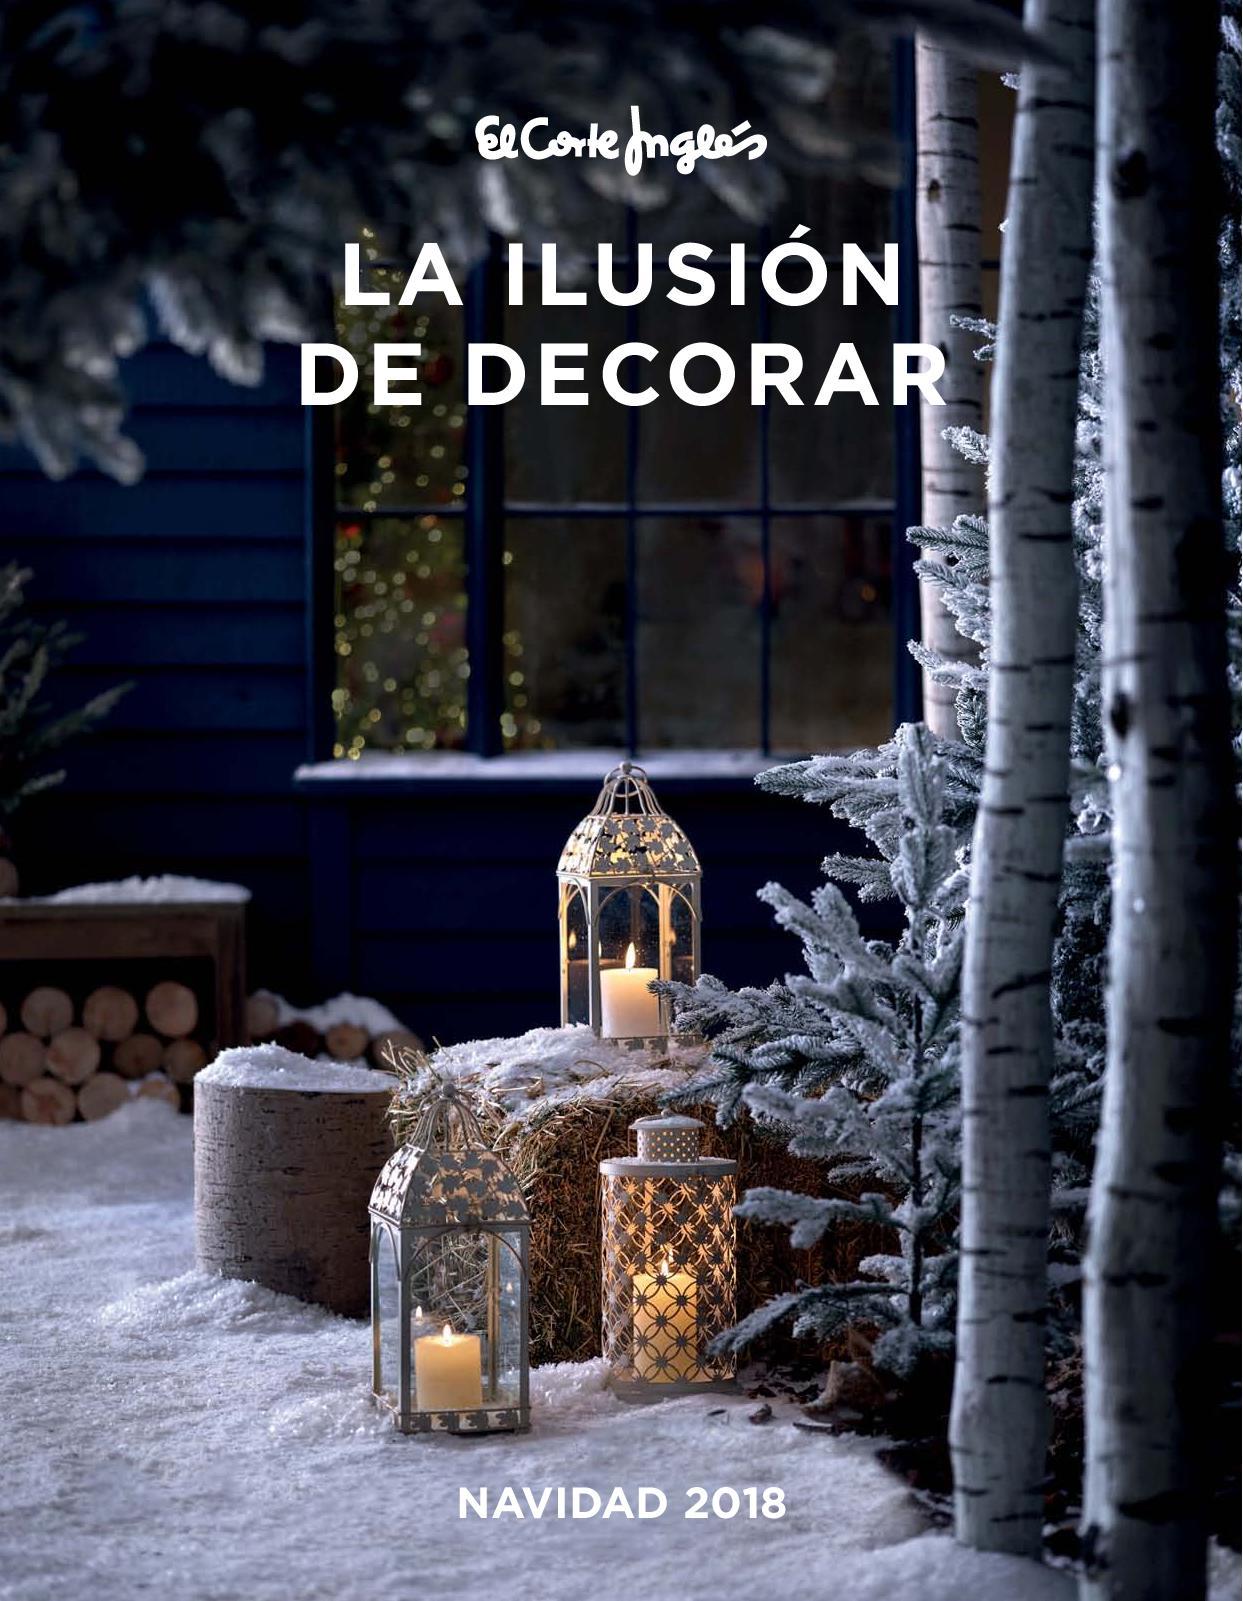 a6d7837598bf7 Calaméo - El Corte Inglés - 2019 01 05 - Catálogo El Corte Inglés - Navidad